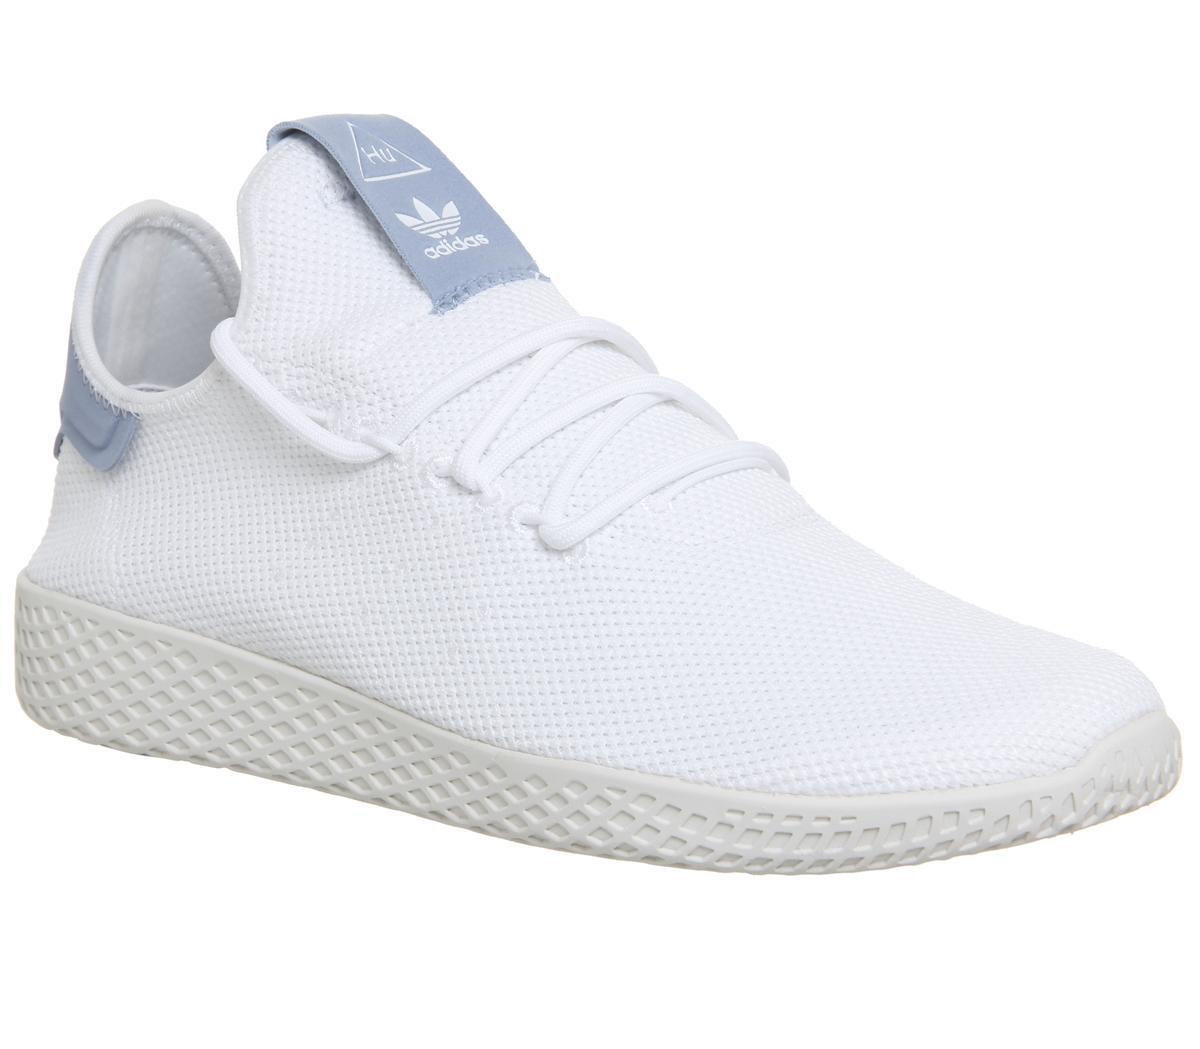 adidas Originals Pw Tennis Hu Men's